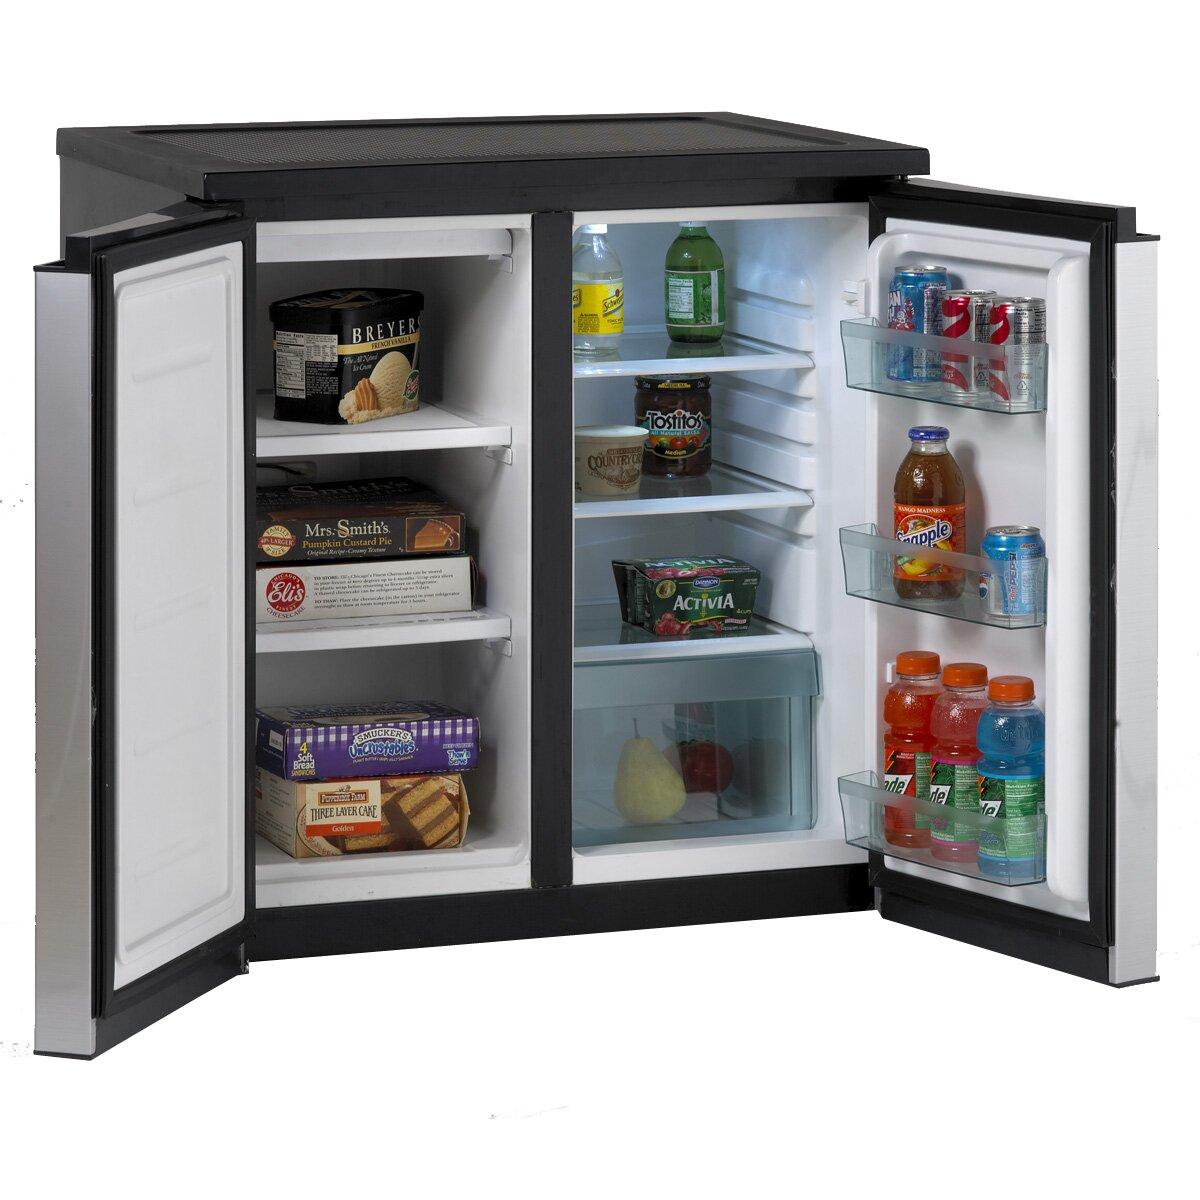 Avanti 5 5 Cu Ft Compact Refrigerator With Freezer